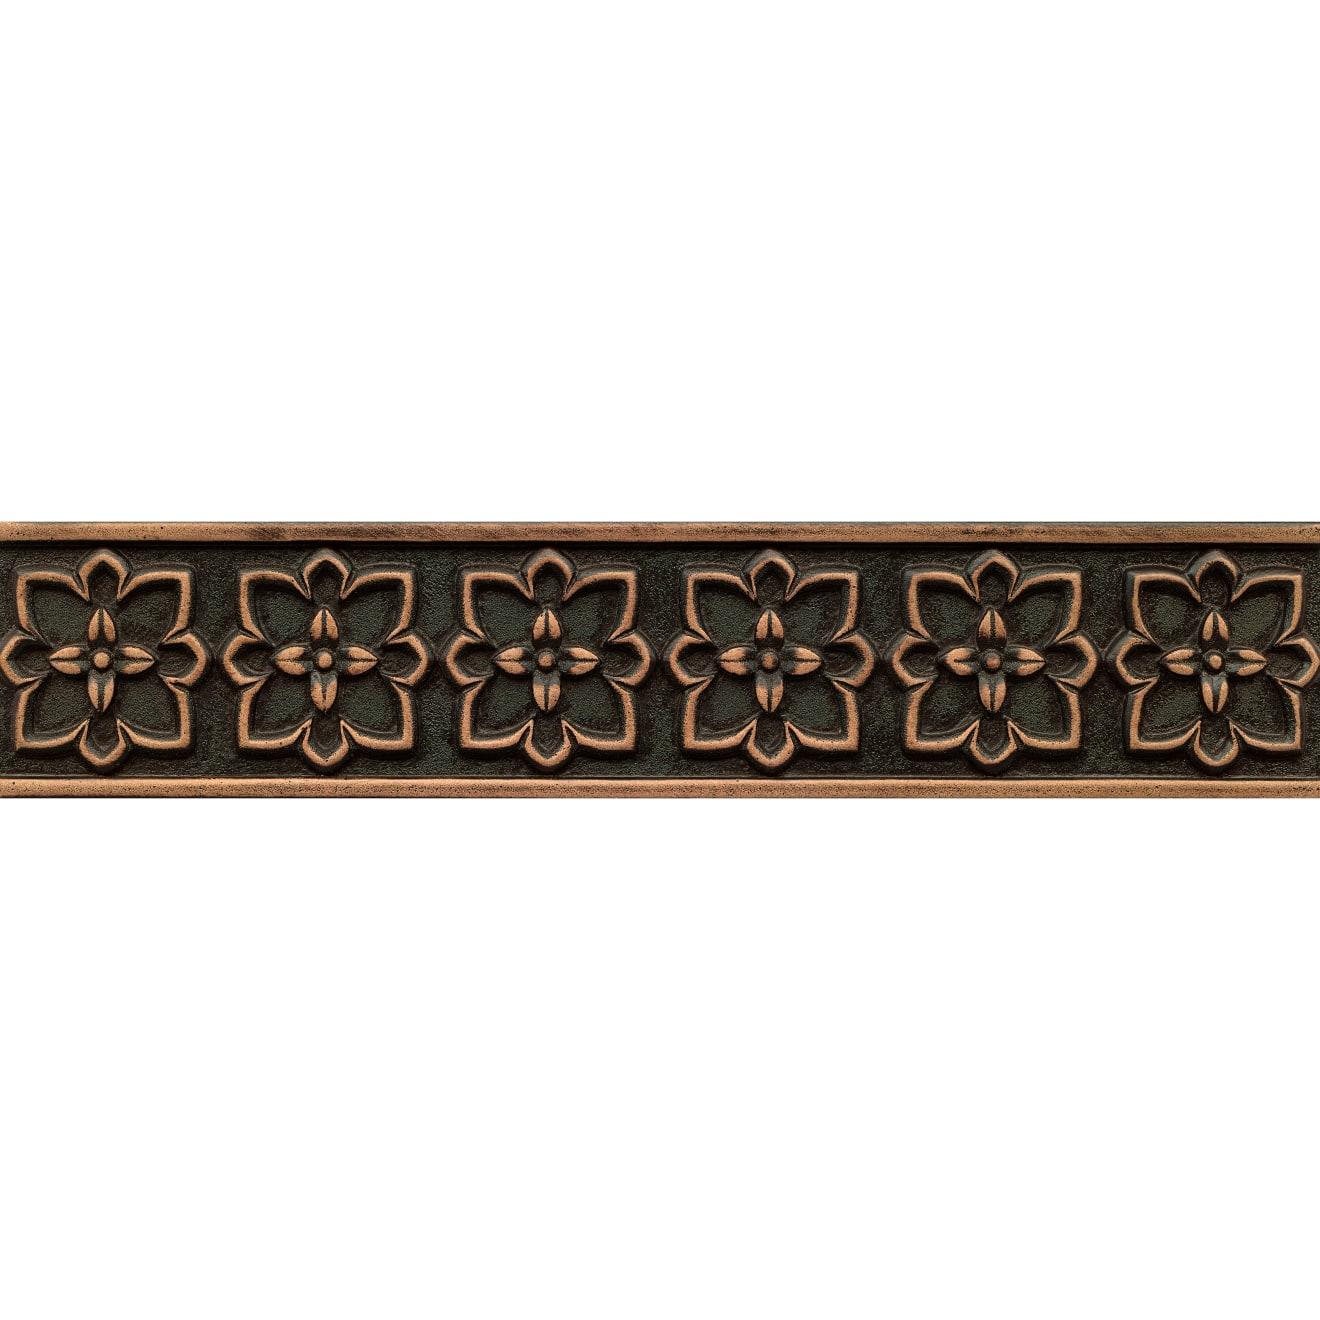 "Ambiance 2.5"" x 12"" Trim in Venetian Bronze"